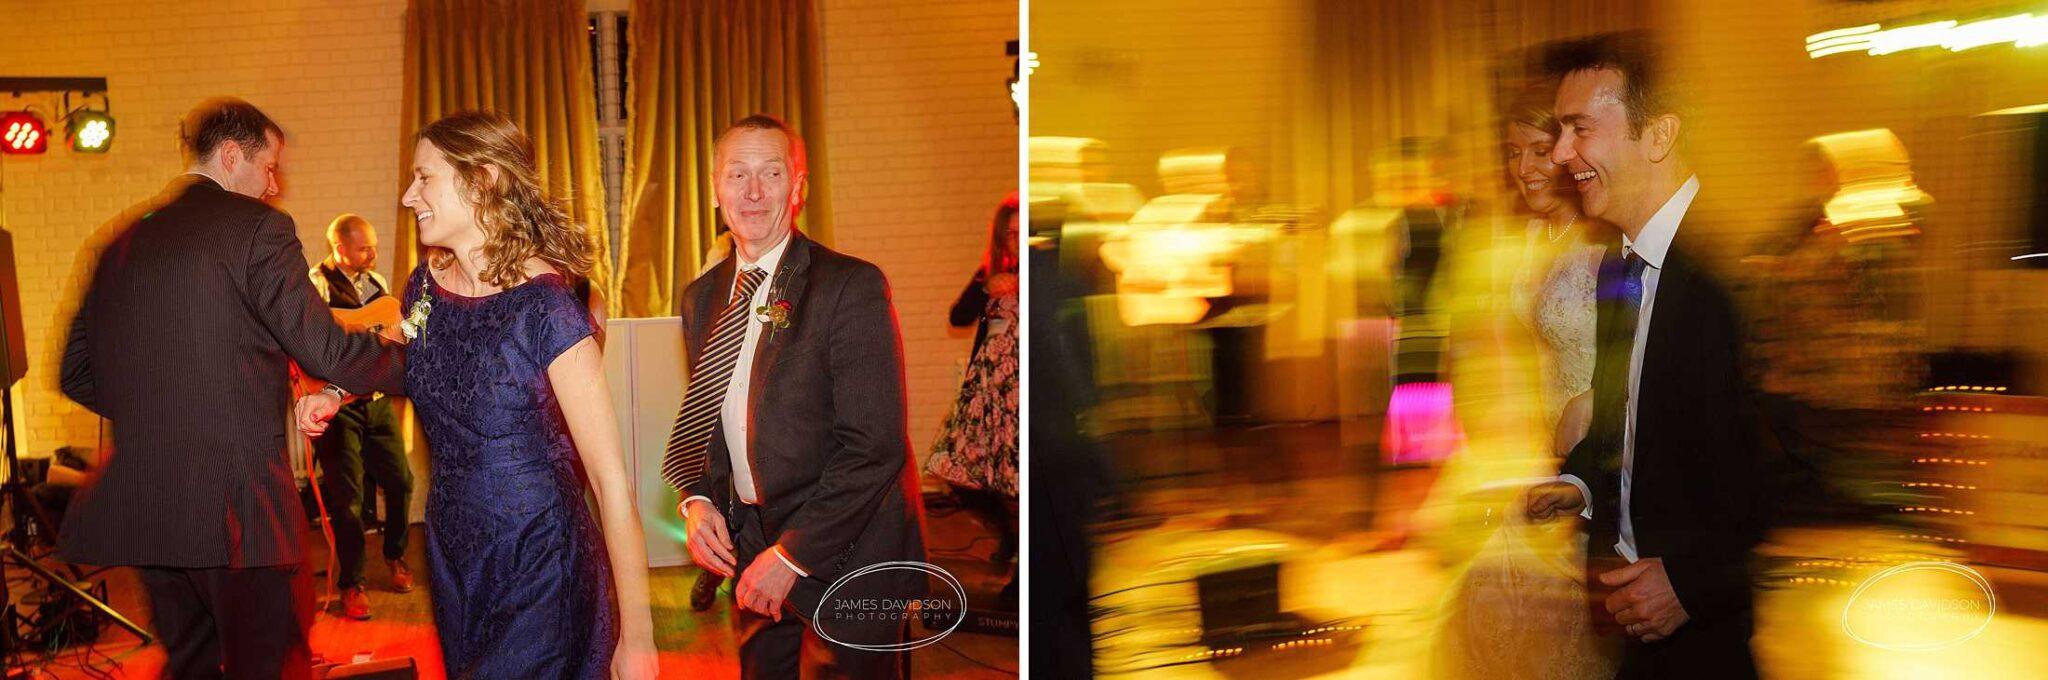 seckford-hall-wedding-091